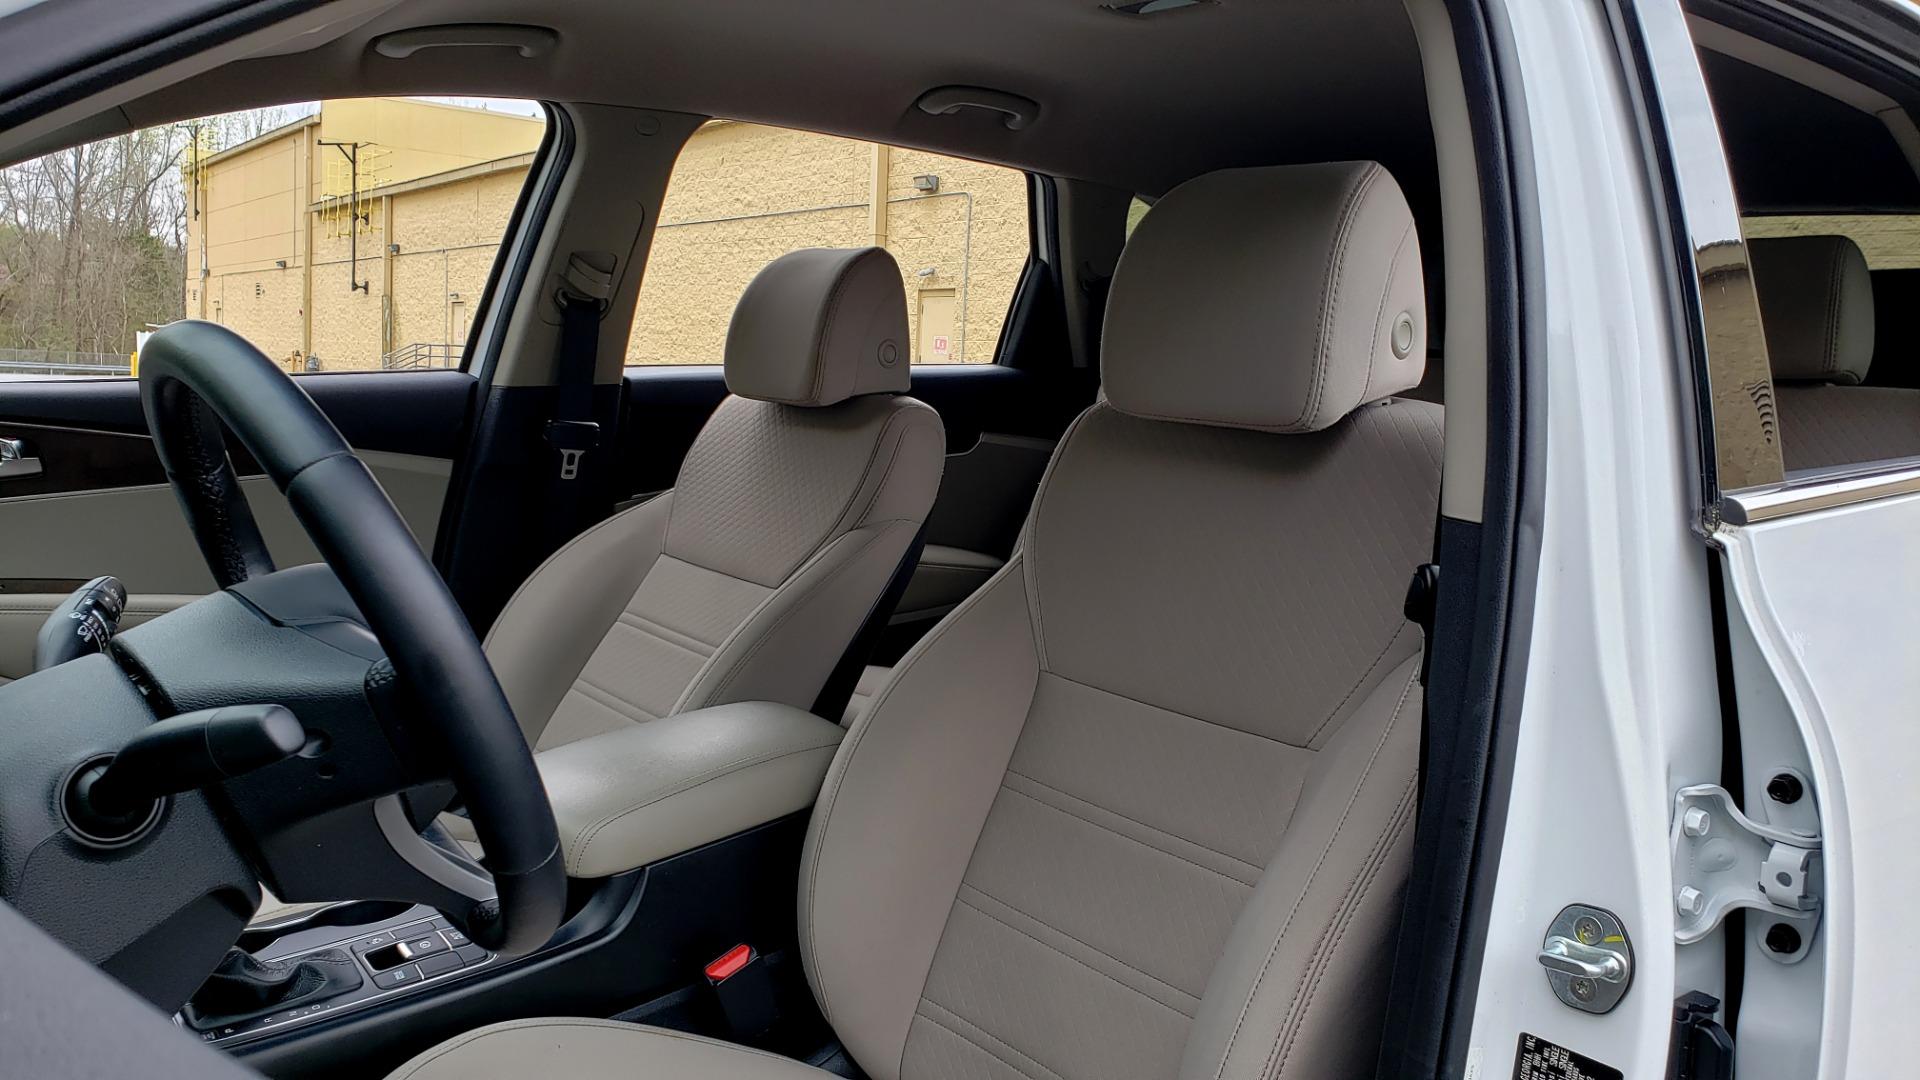 Used 2017 Kia SORENTO LX CONV PKG / FWD / ADVANCED TECH / 3-ROW for sale Sold at Formula Imports in Charlotte NC 28227 35